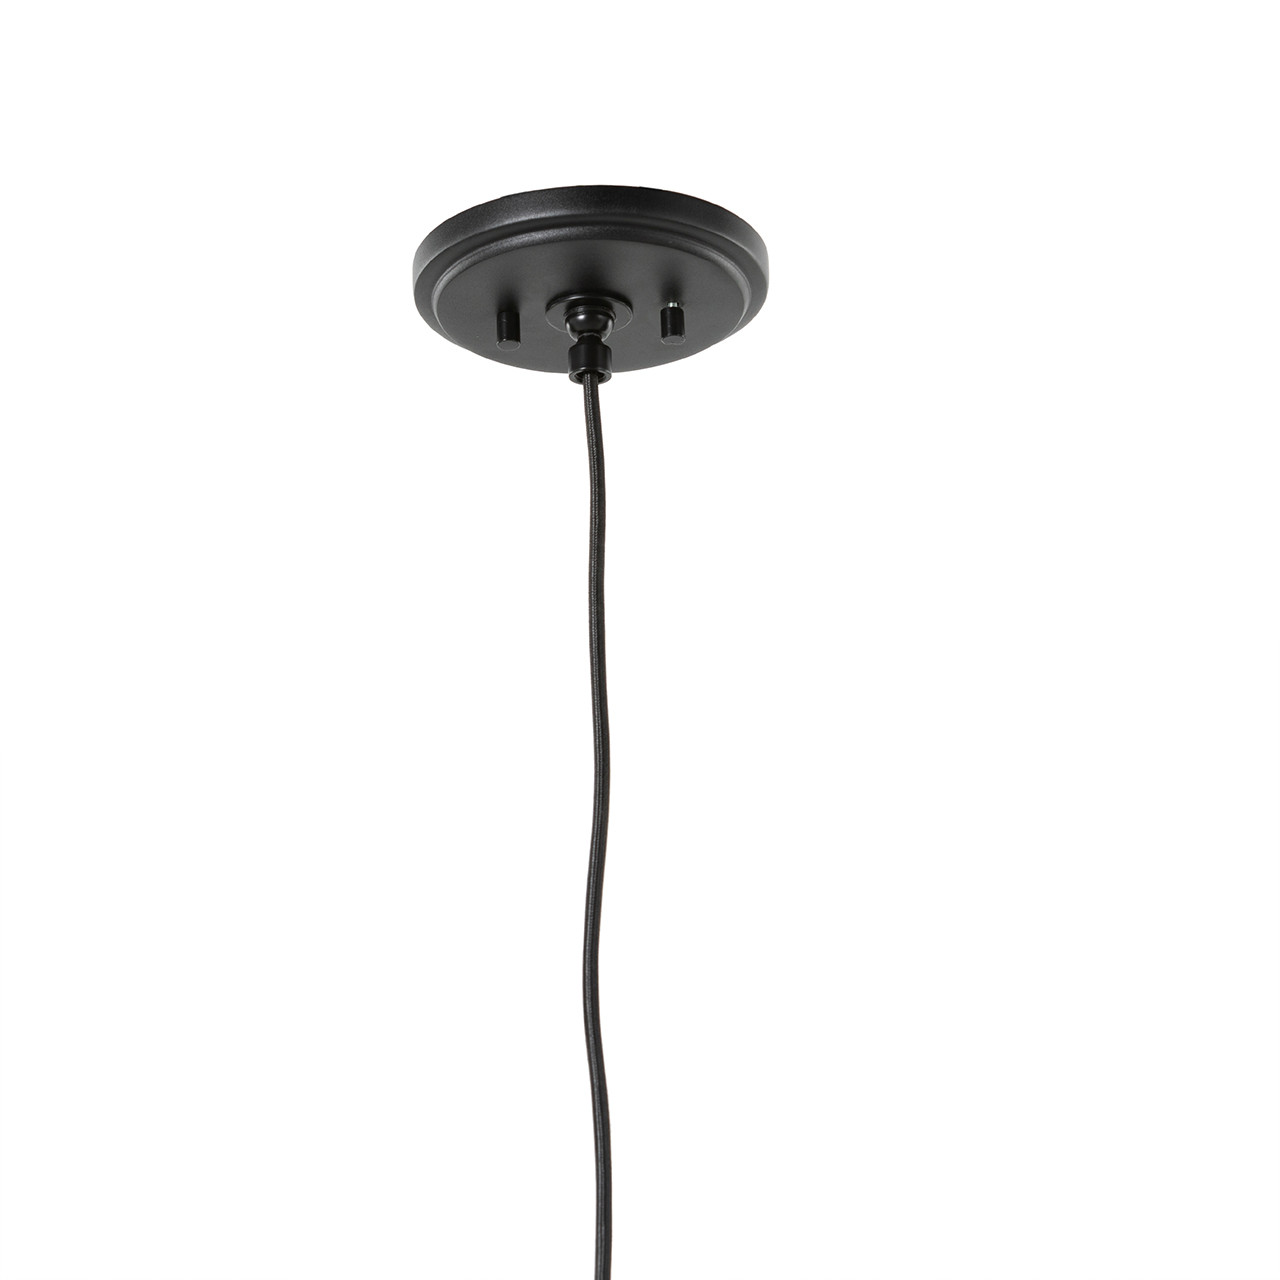 Whynn Pendant - Powder Coated Black & White